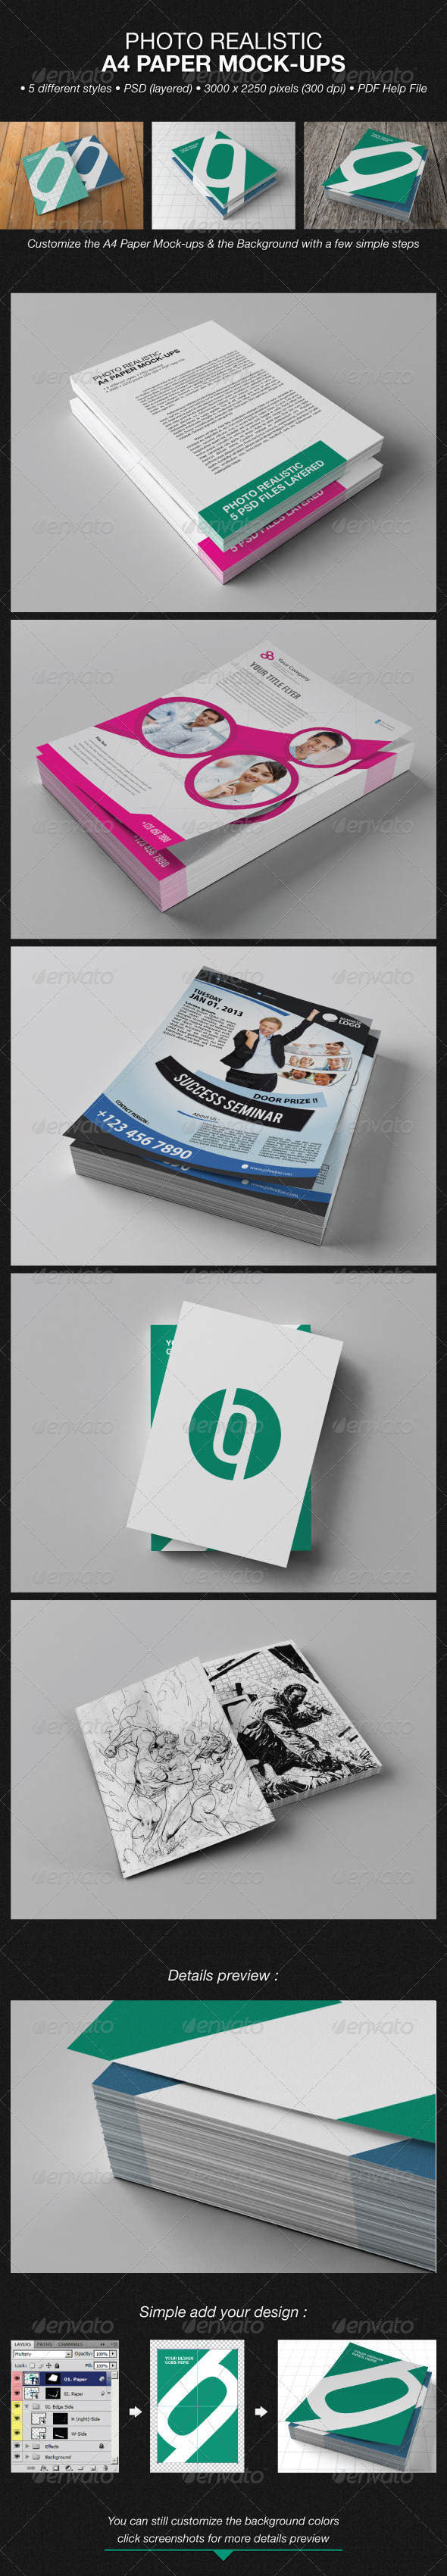 Photo Realistic A4 Paper Mock-Ups - Flyers Print